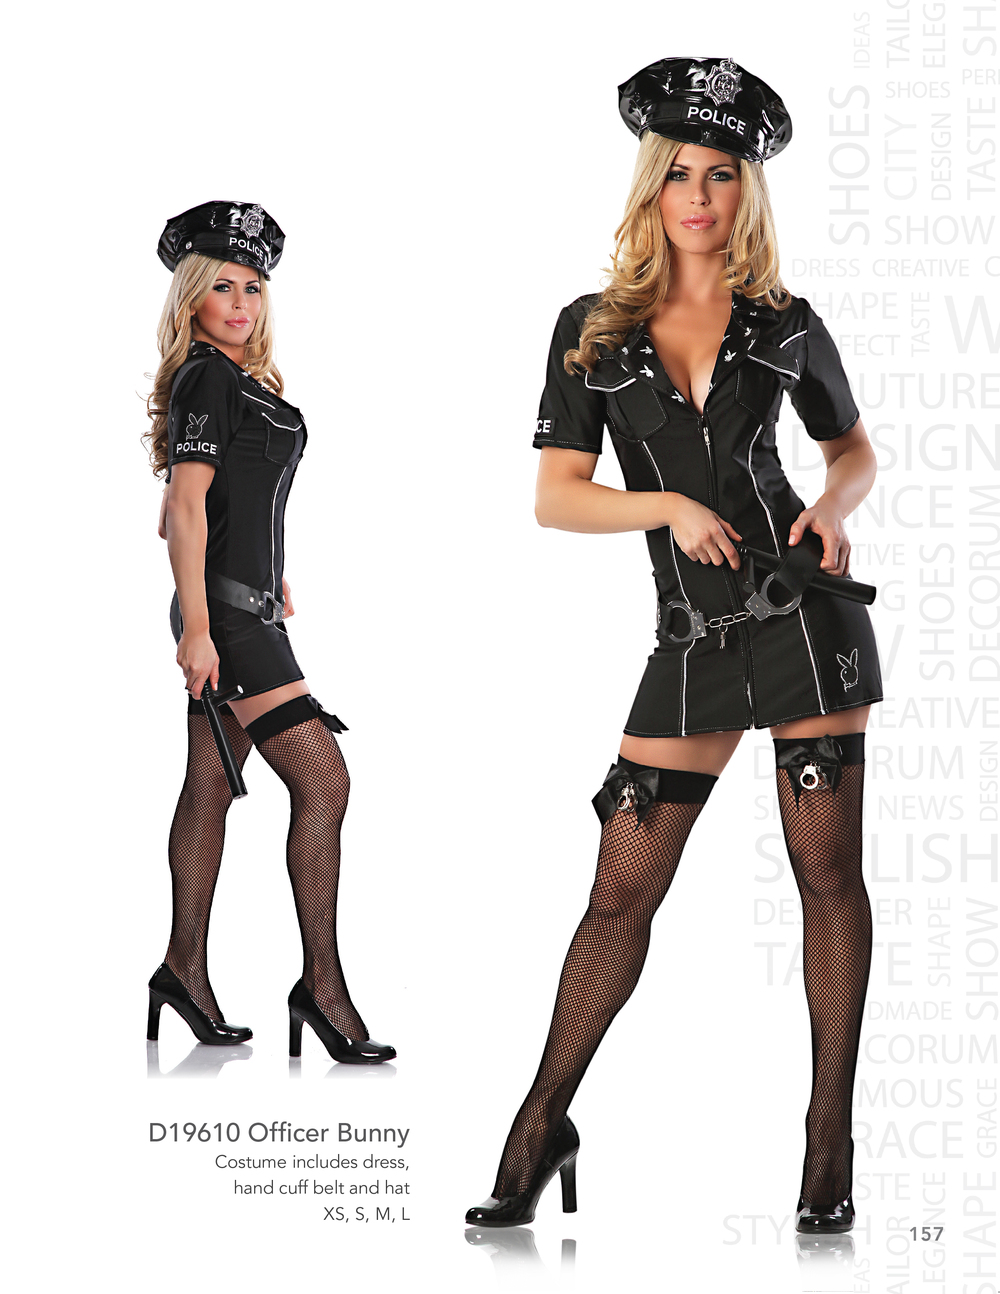 D19610 Officer Bunny